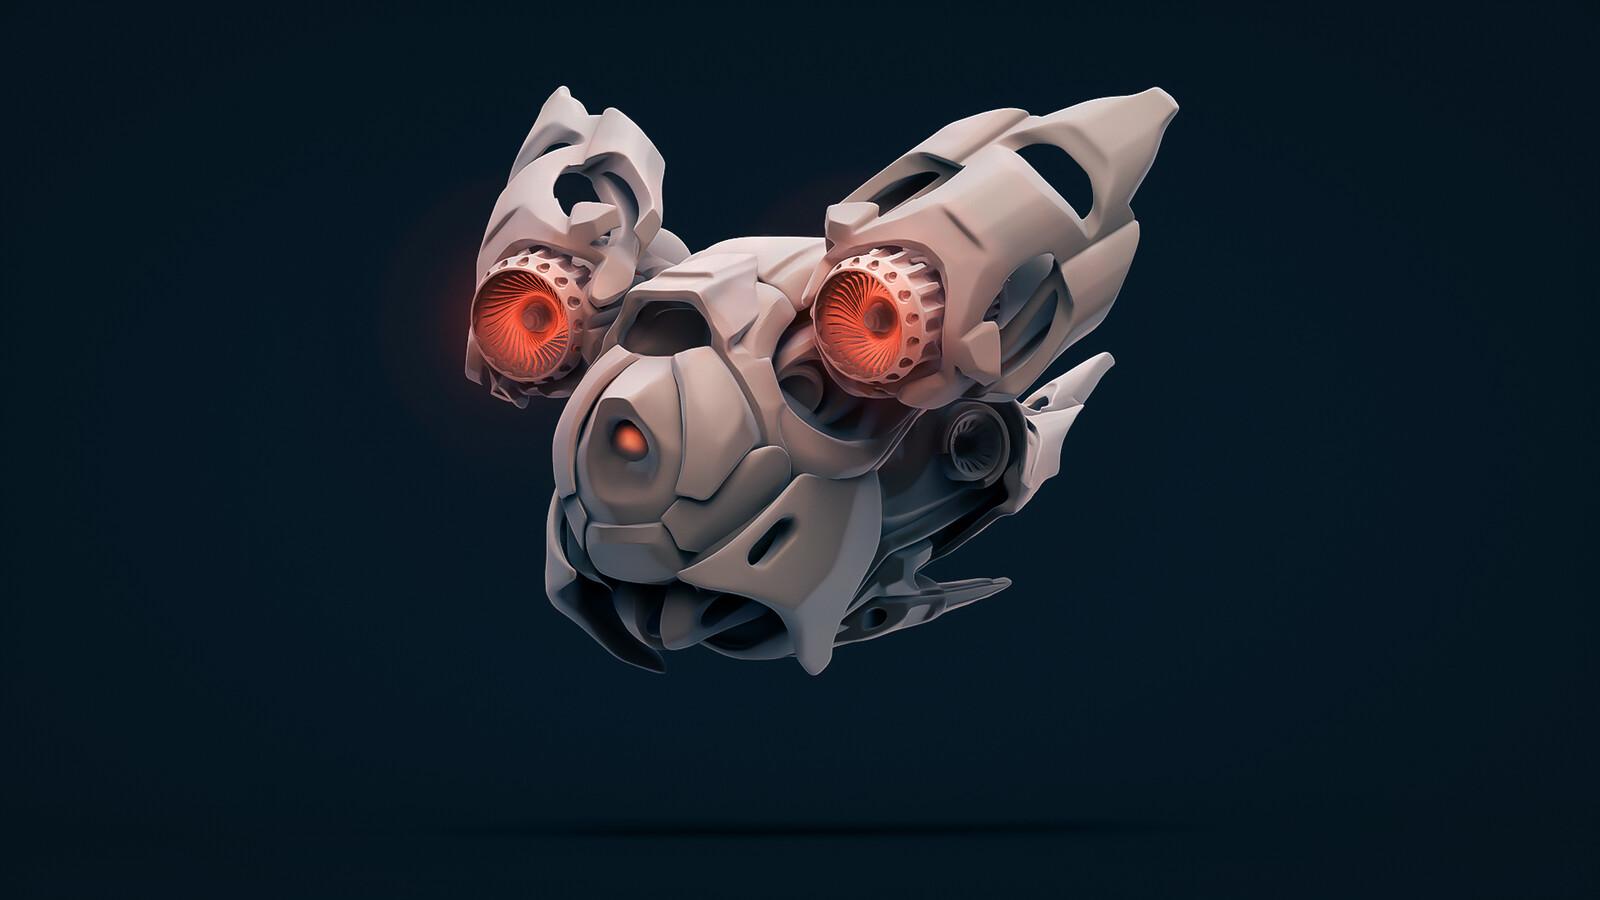 Final drone concept art